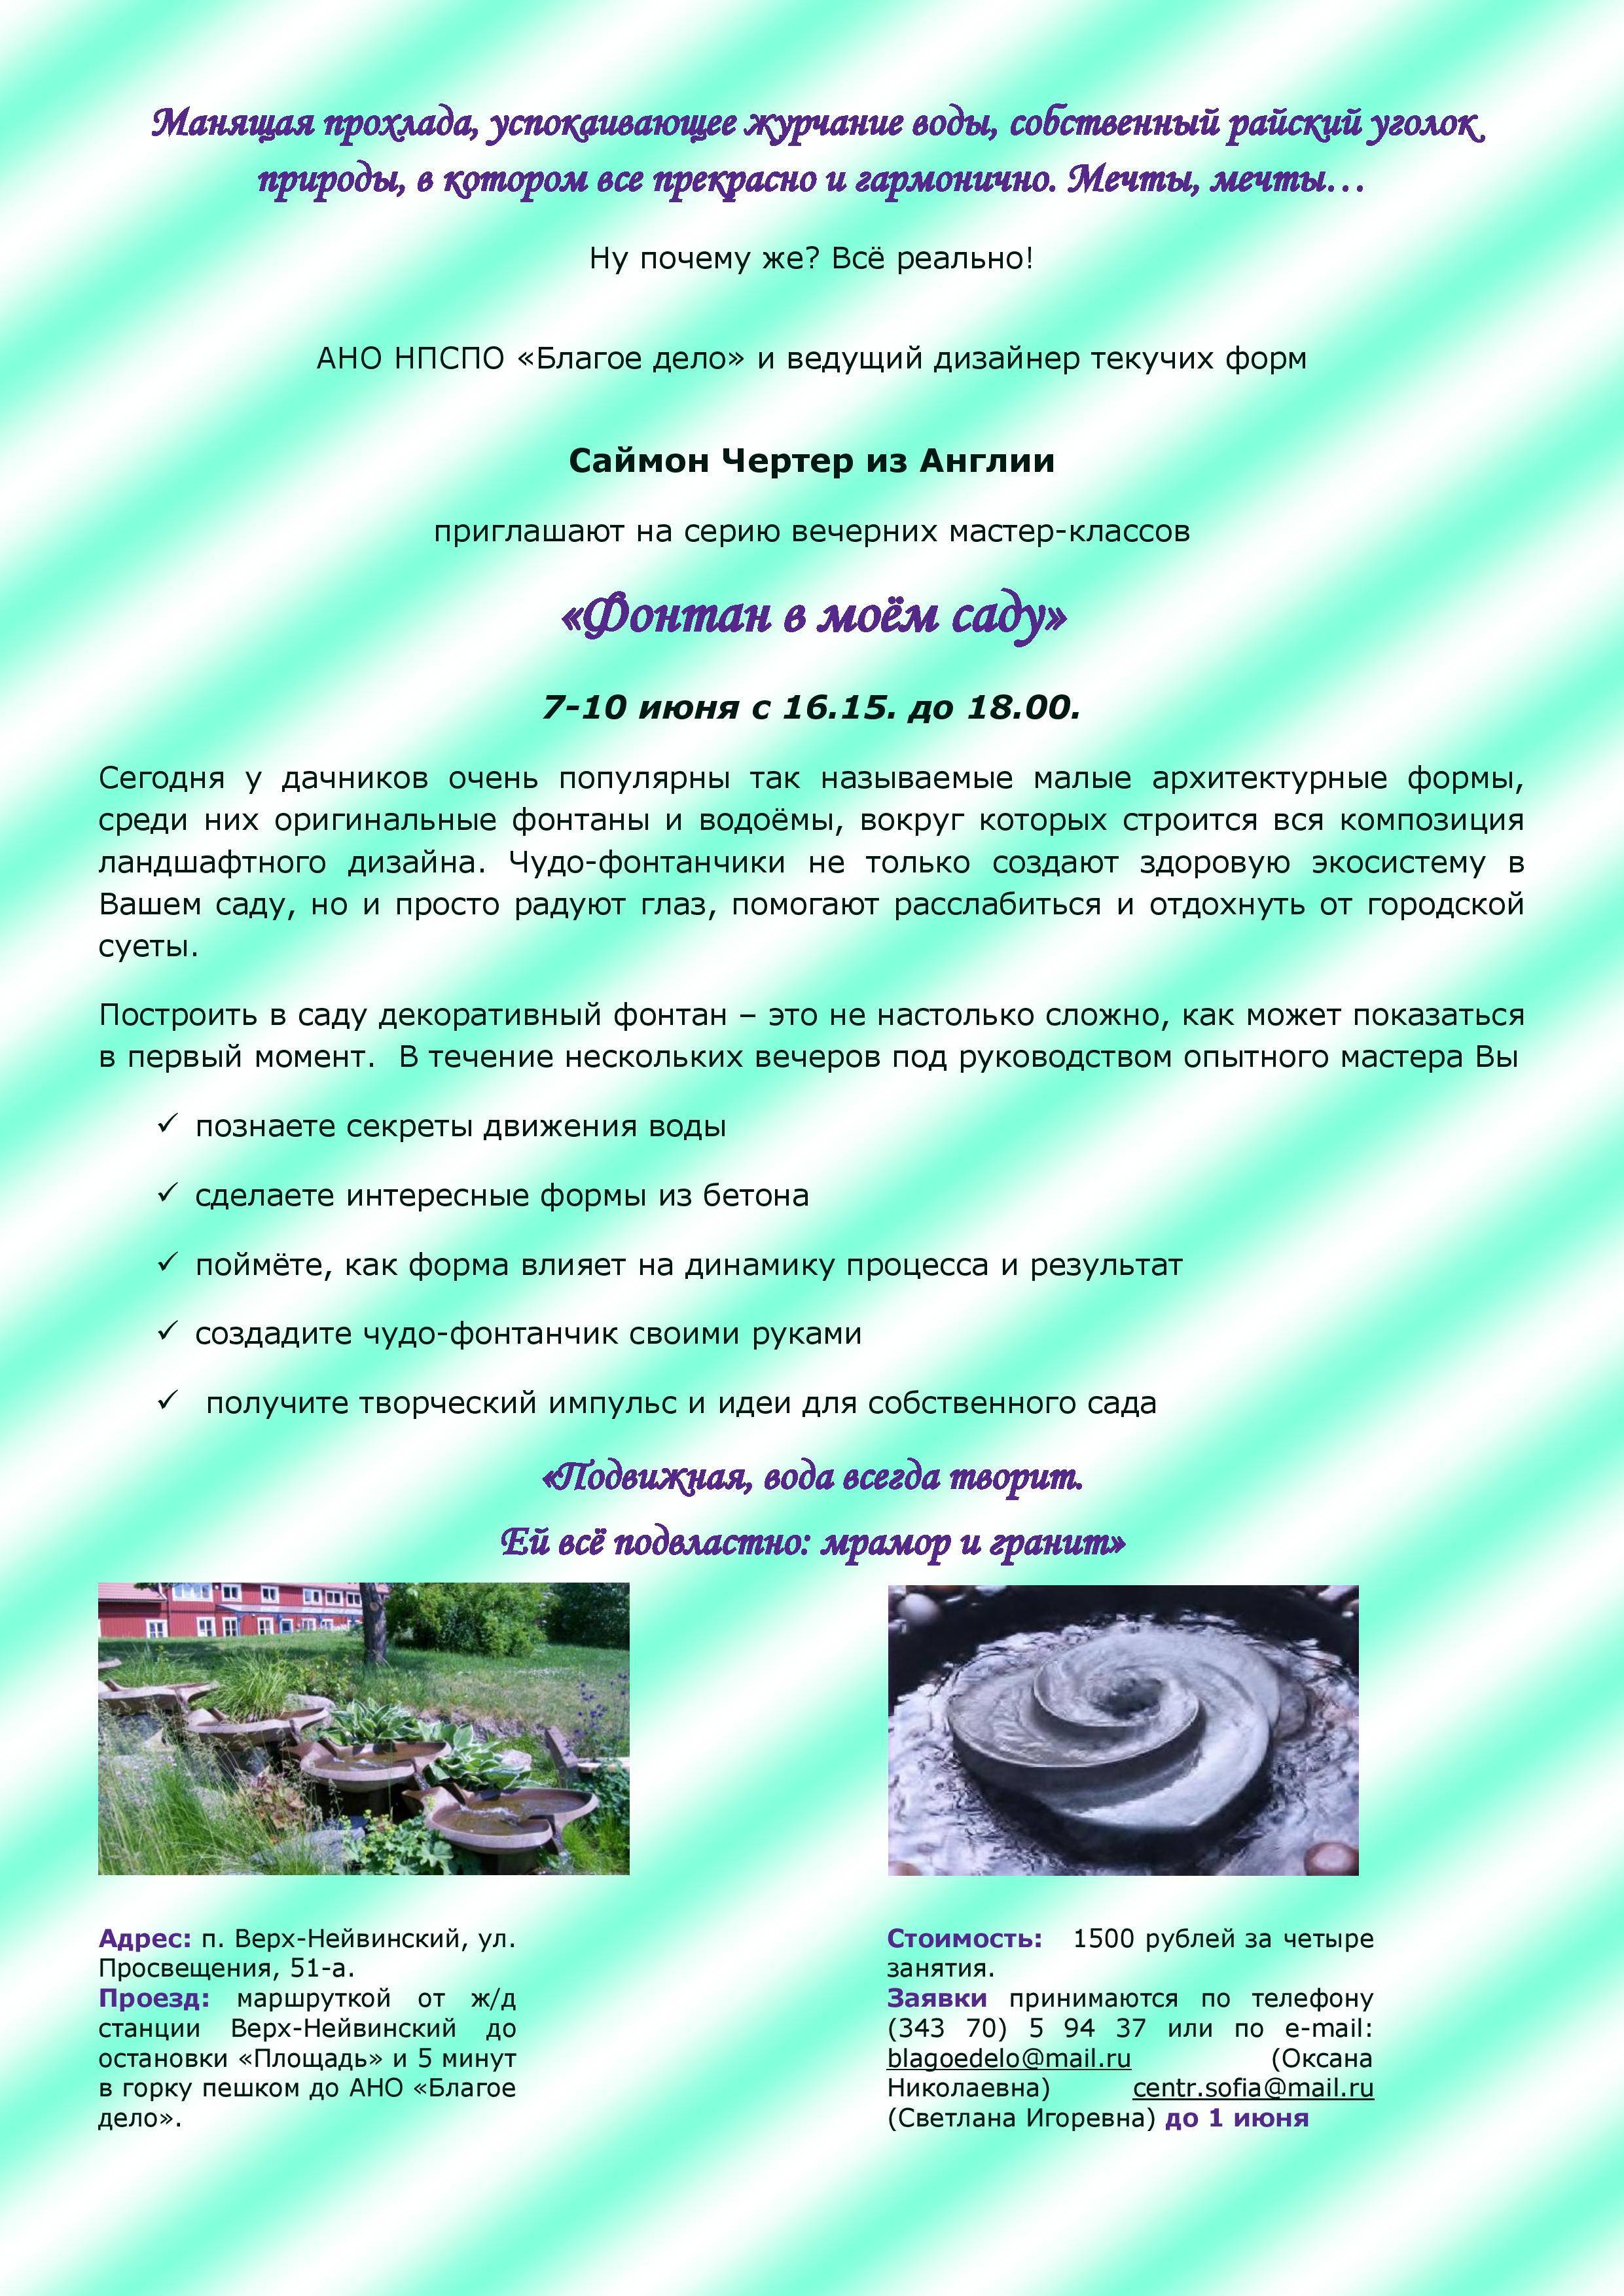 Мастер-класс Фонтан-page-001